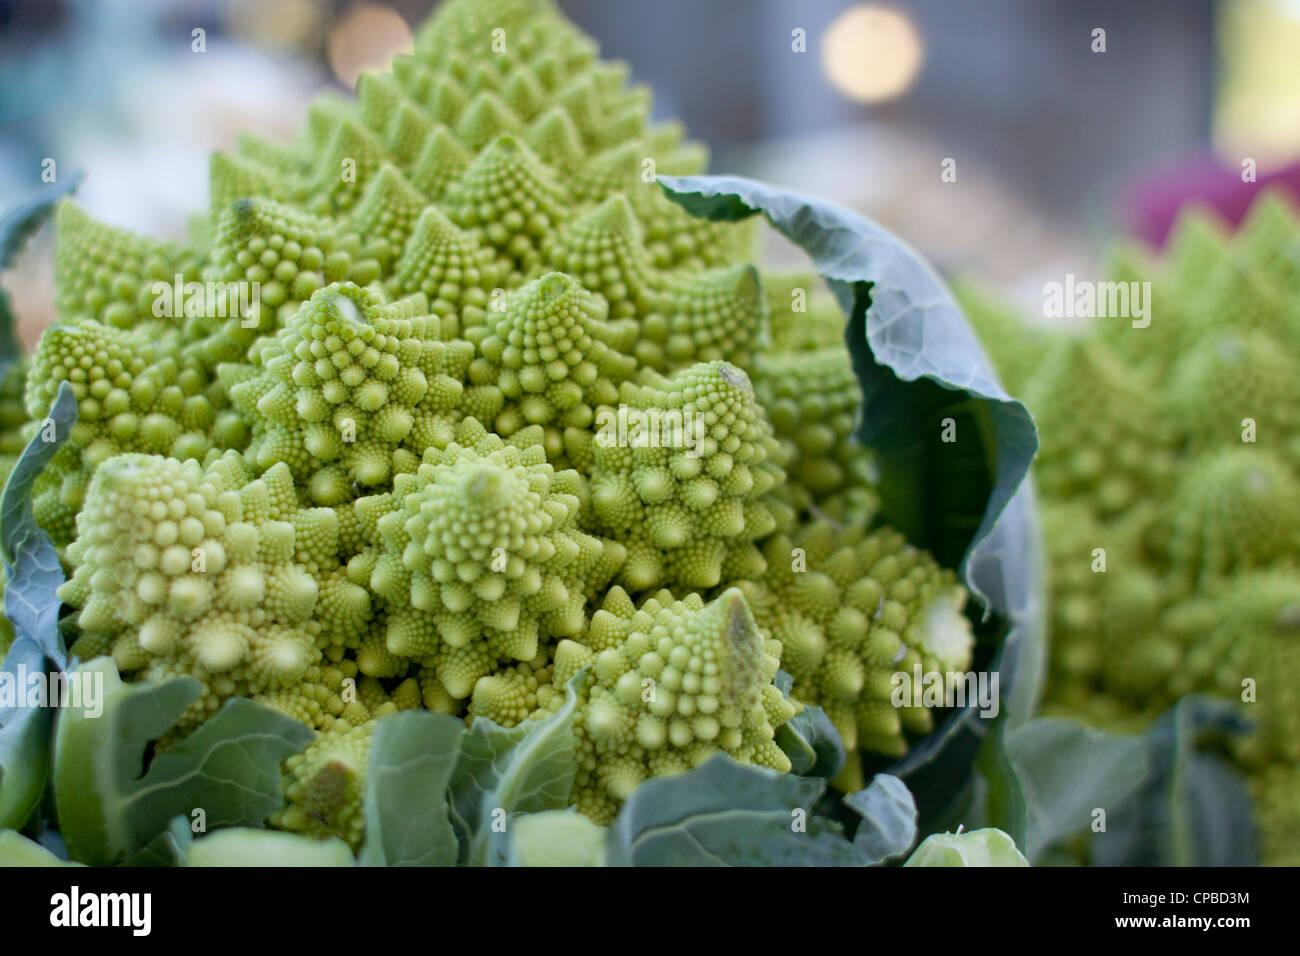 Farm fresh Romanesco broccoli, a variant of cauliflower aka broccoflower, on display at a farmer's market in - Stock Image